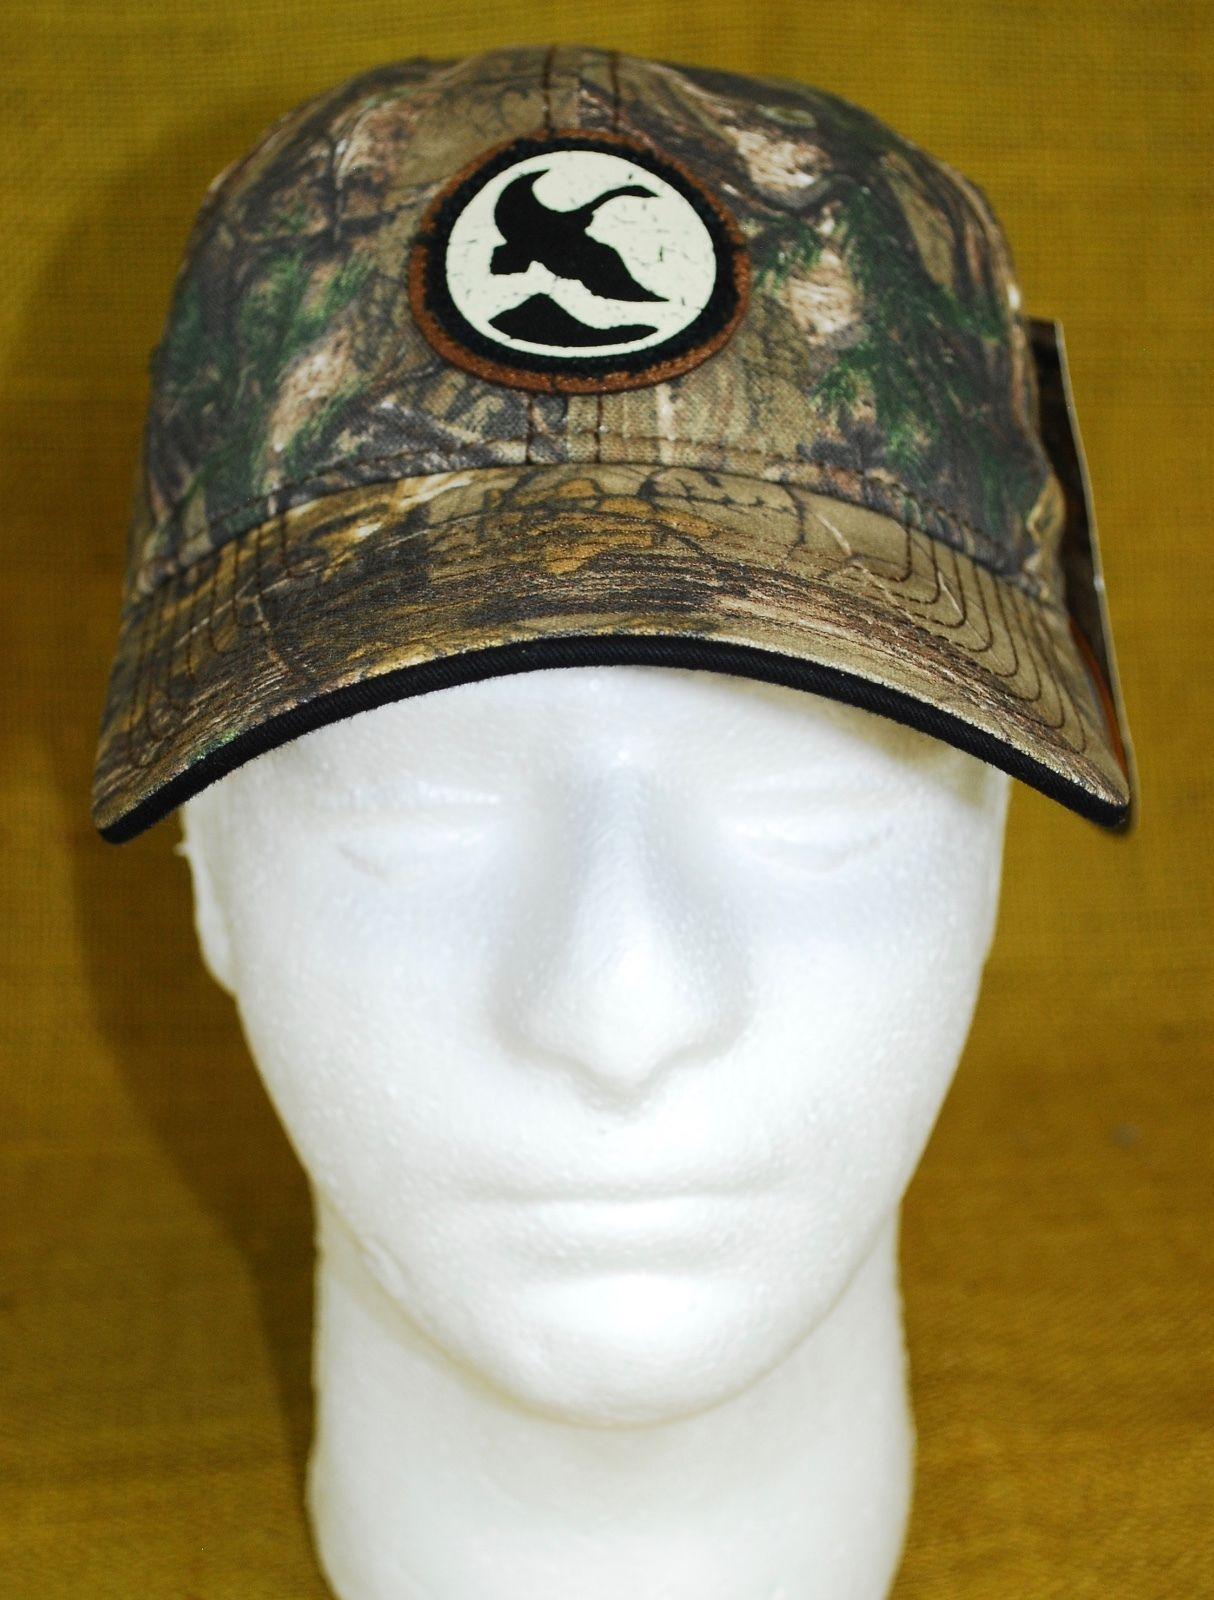 d7c15e1d6d449 NEW Gander Mountain Hat Realtree Camouflage Camo Men s Hunting Adjustable  Cap